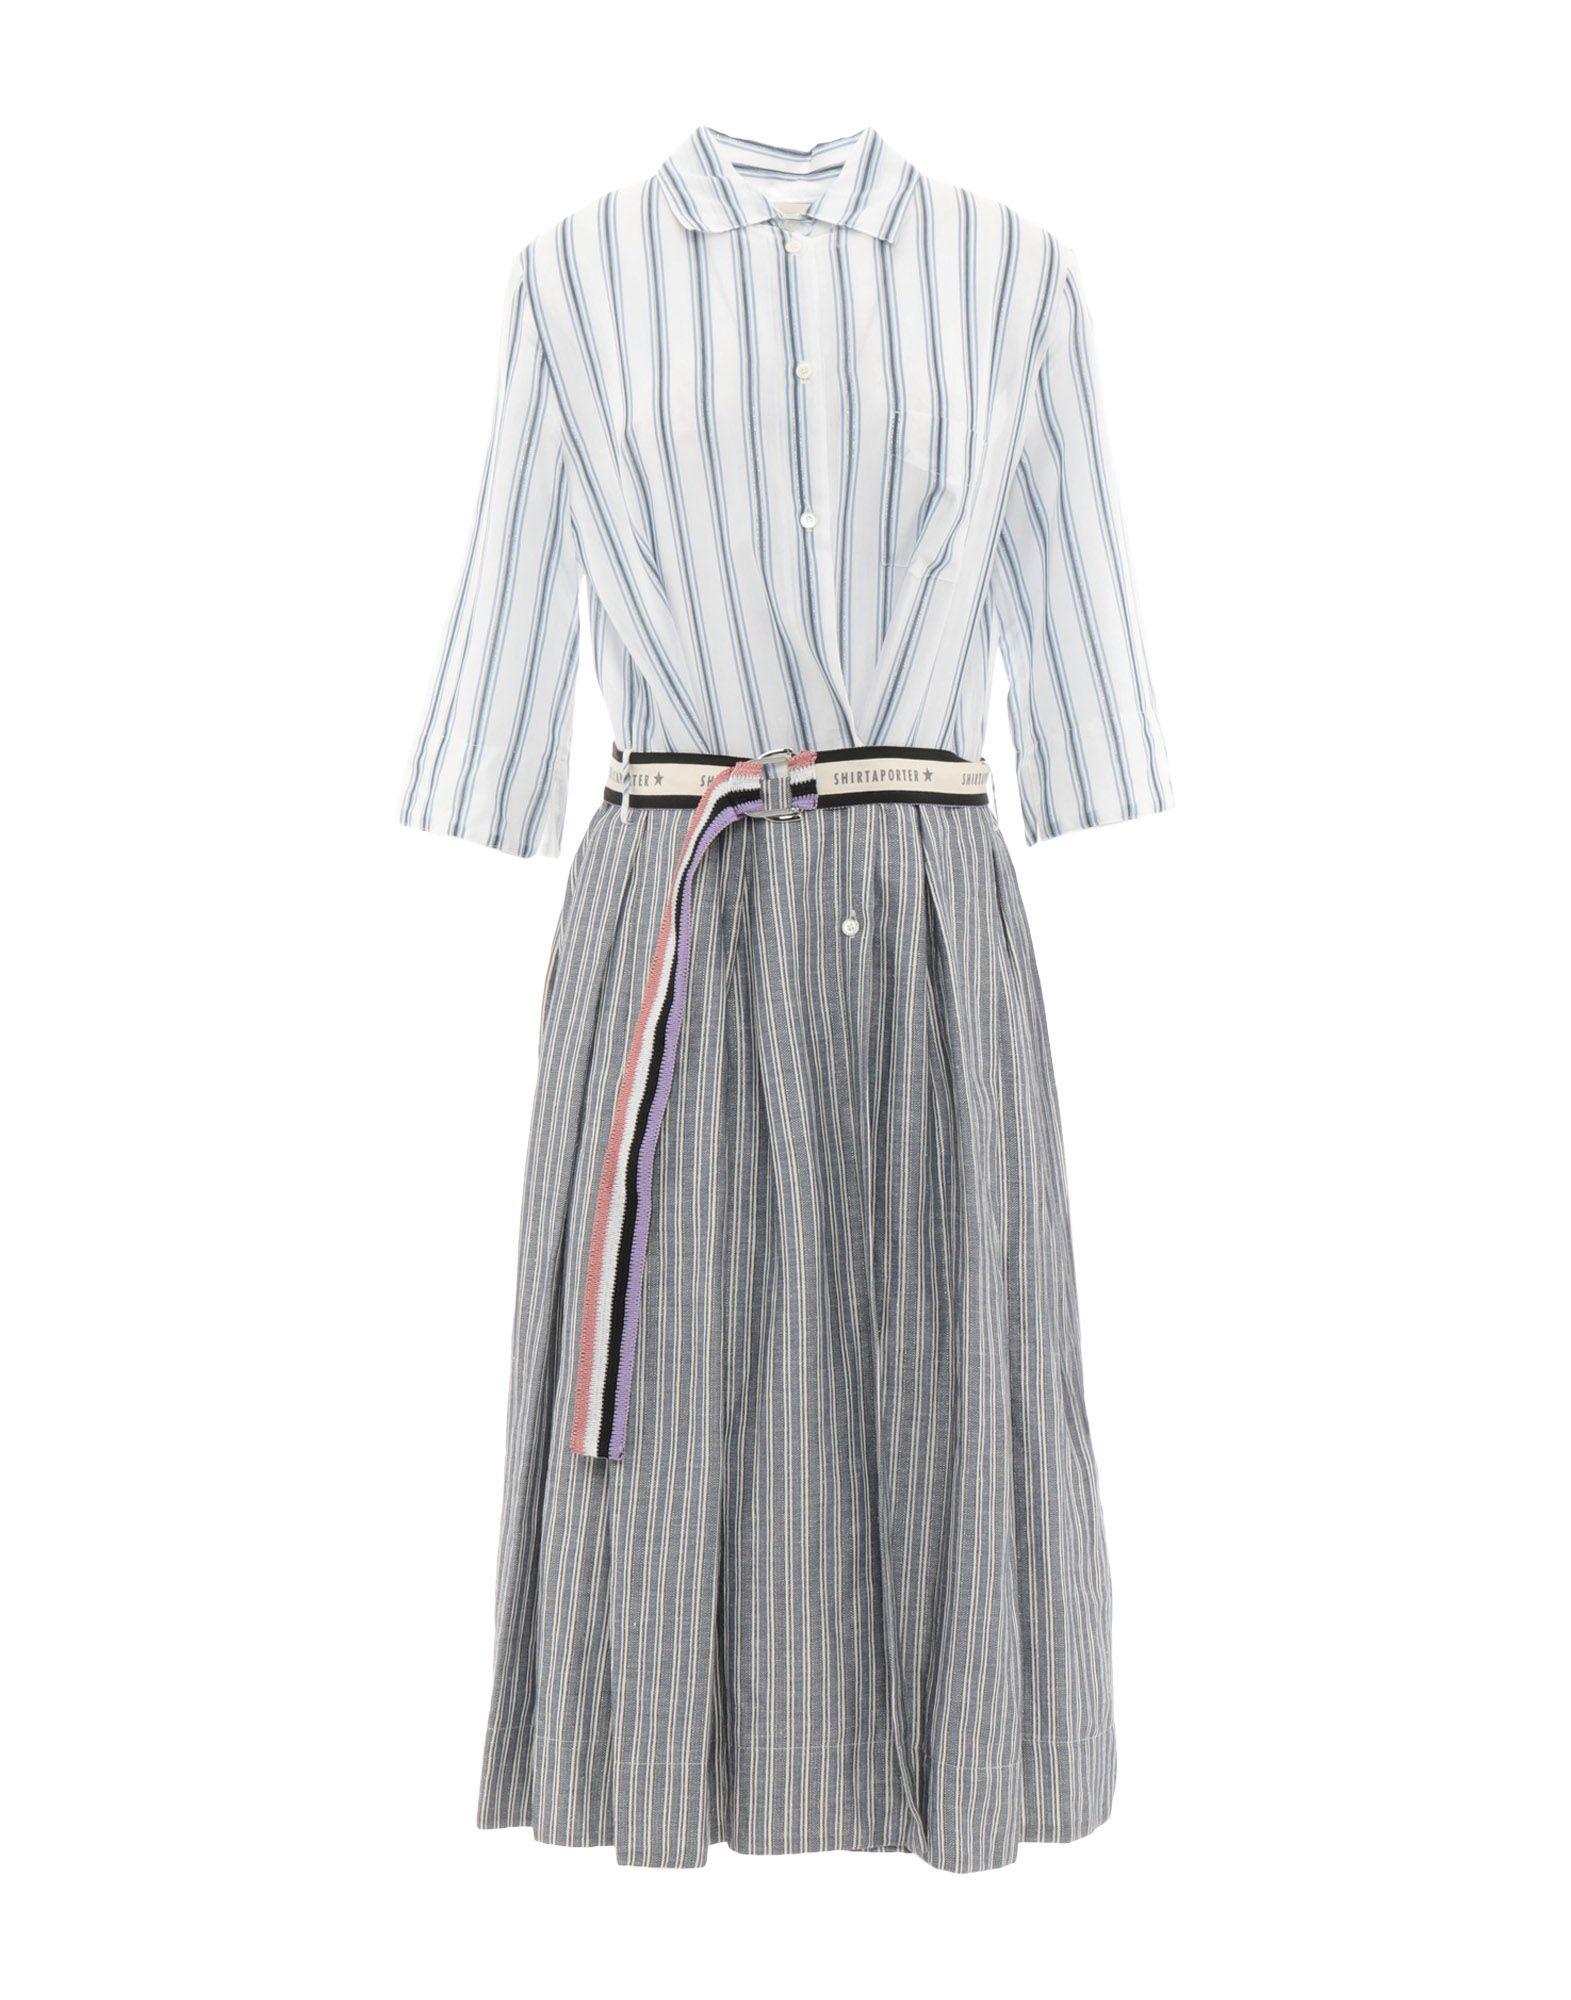 SHIRTAPORTER Платье длиной 3/4 цены онлайн